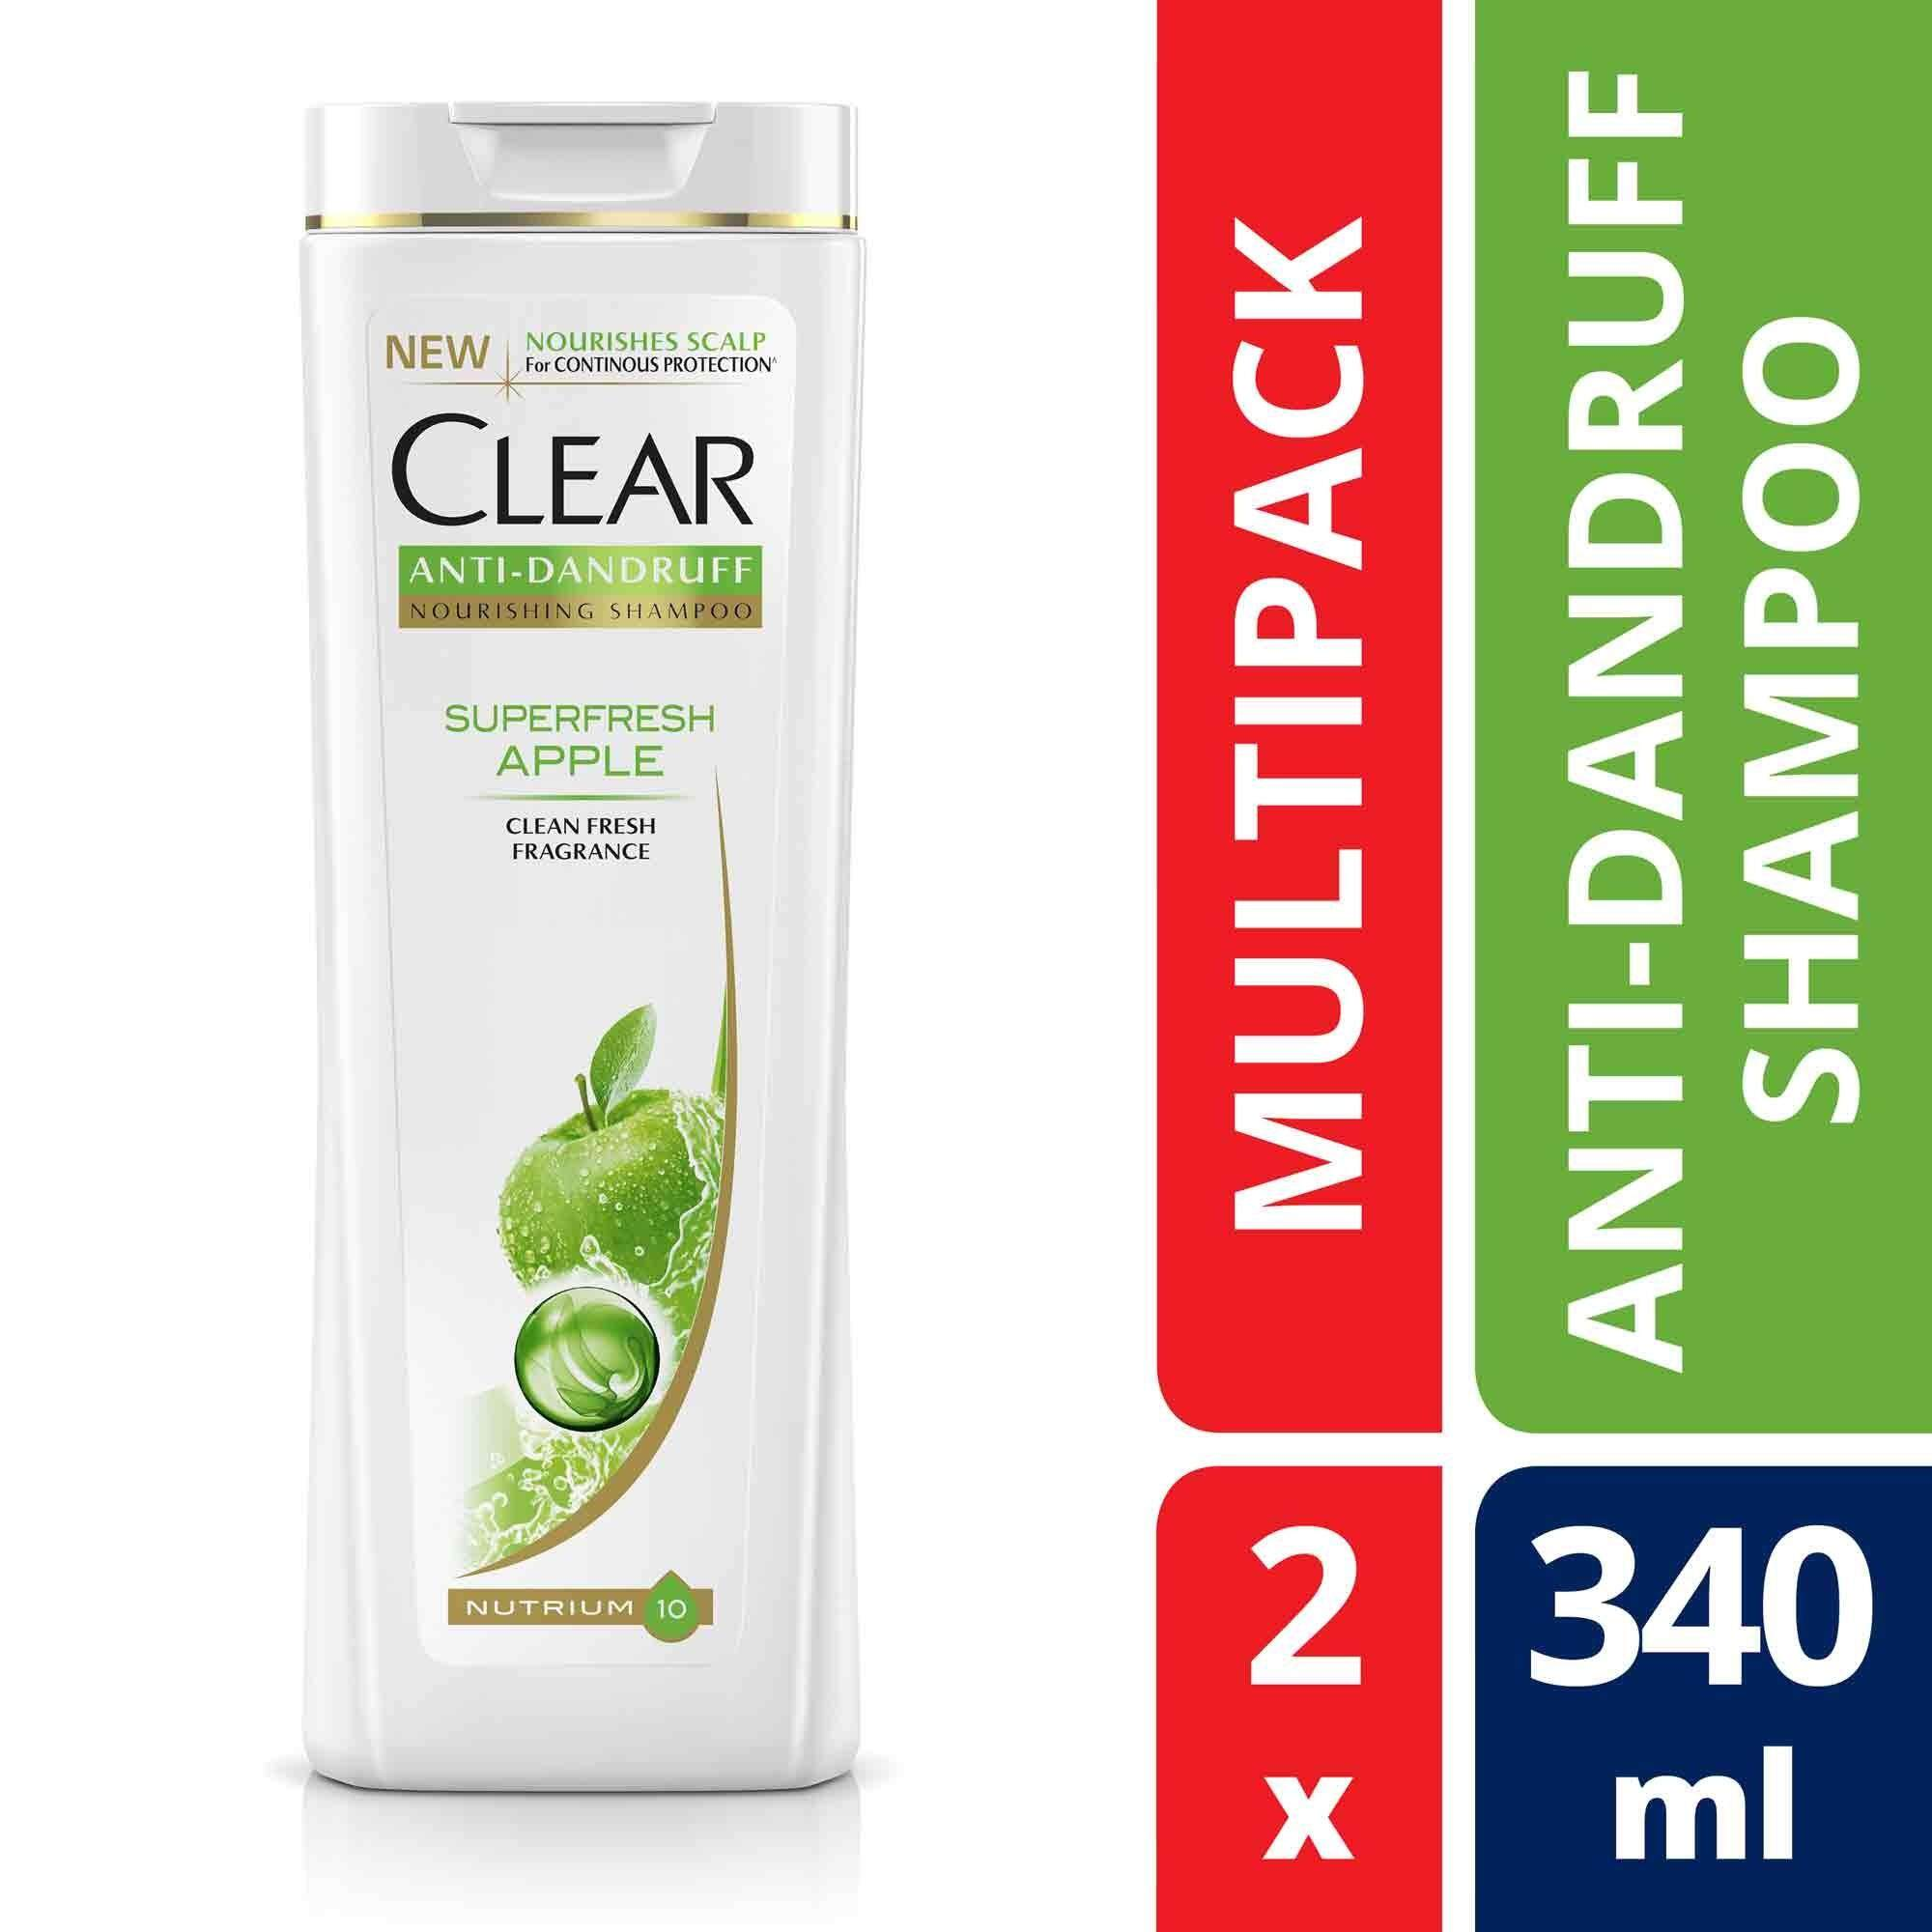 Sell Eleven 2 Clear Cheapest Best Quality My Store Shampoo Anti Ketombe Ice Cool Menthol 340 Ml Tiwin Pack Myr 37 Superfresh Apple Dandruff X 2myr37